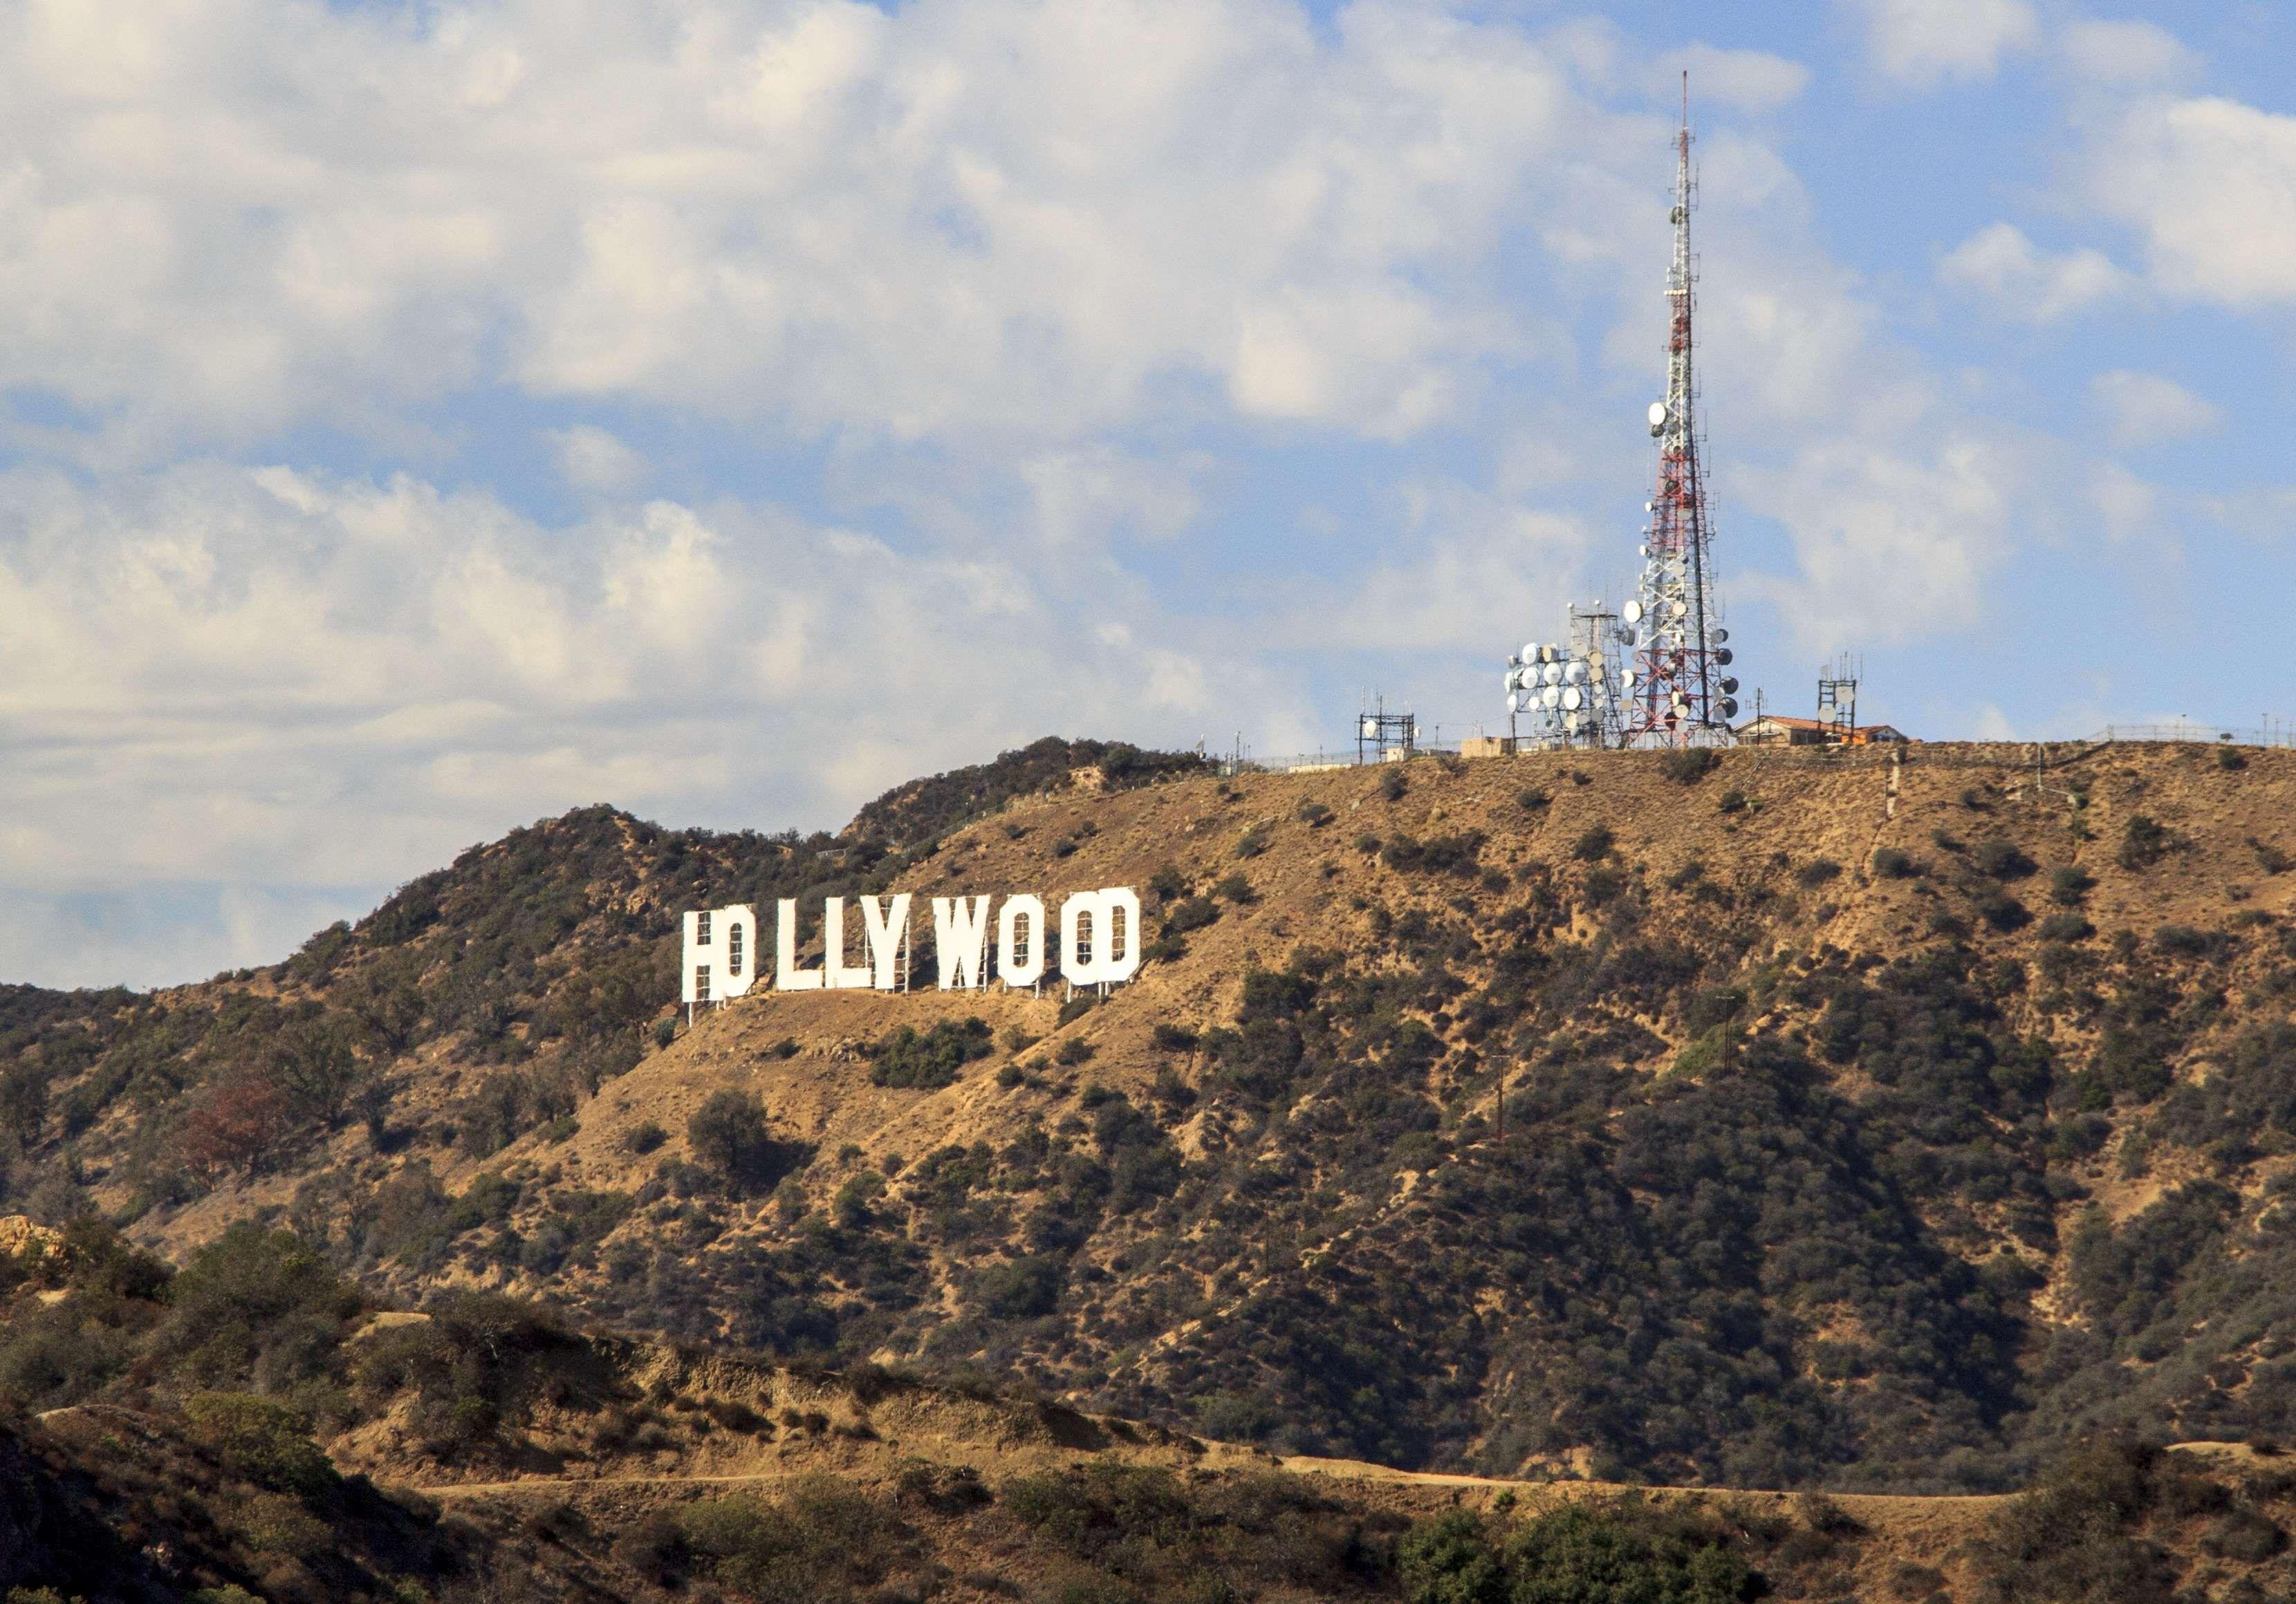 Fantastic Wallpaper Mountain Hollywood - da866a3d9f2c1d8aa7e8753e8e15d7fc  2018_58713.jpg